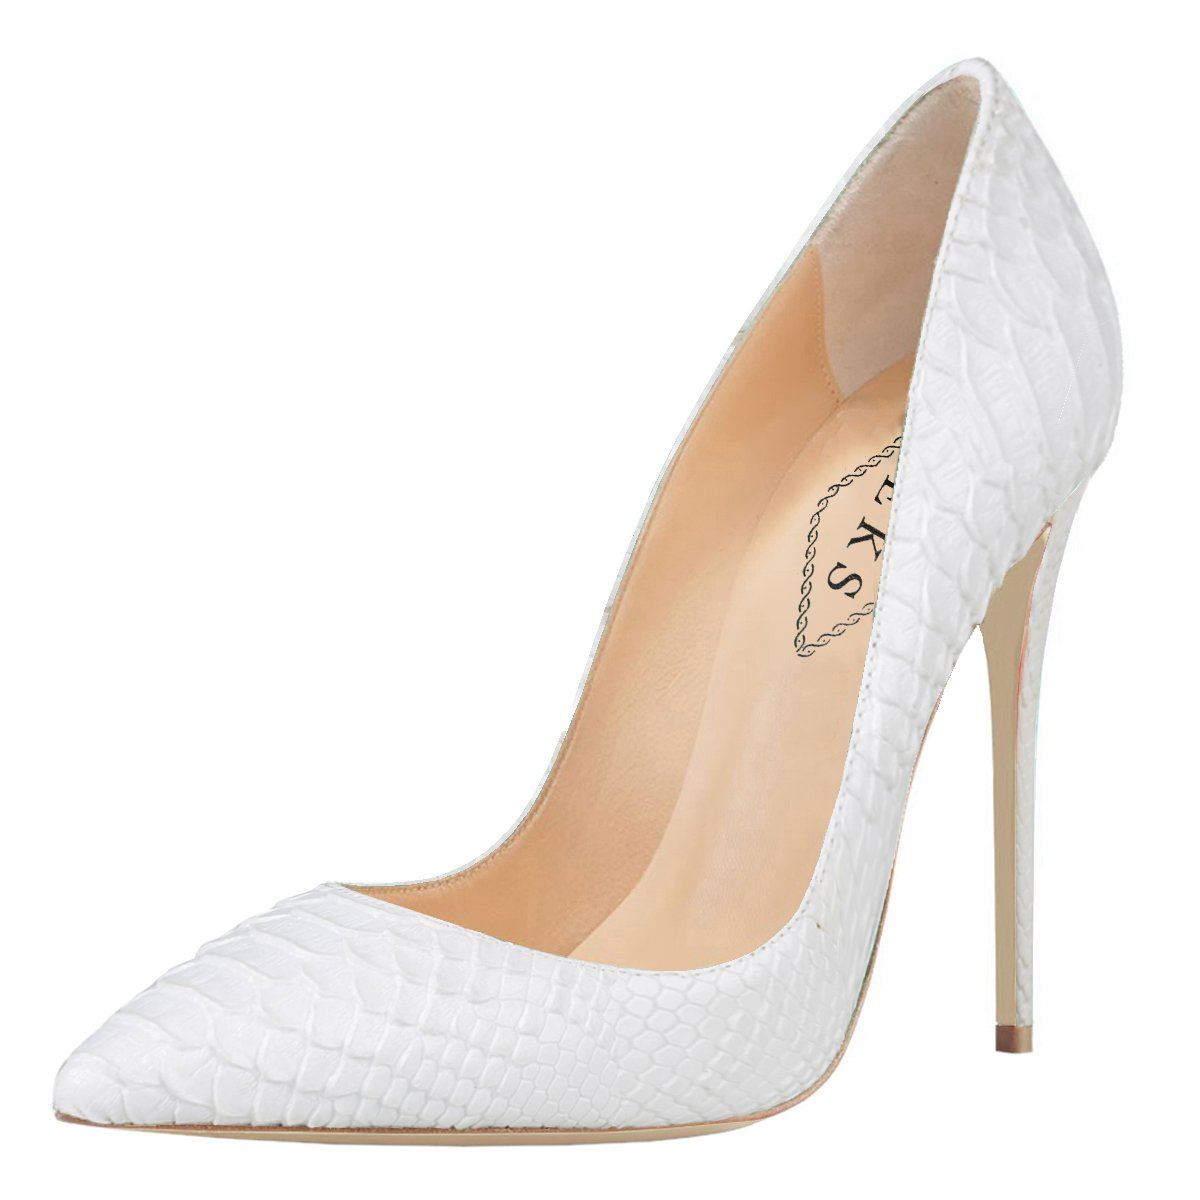 EKS - Zapatos de Tacón Mujer 45 EU|Wei-Snakeskin